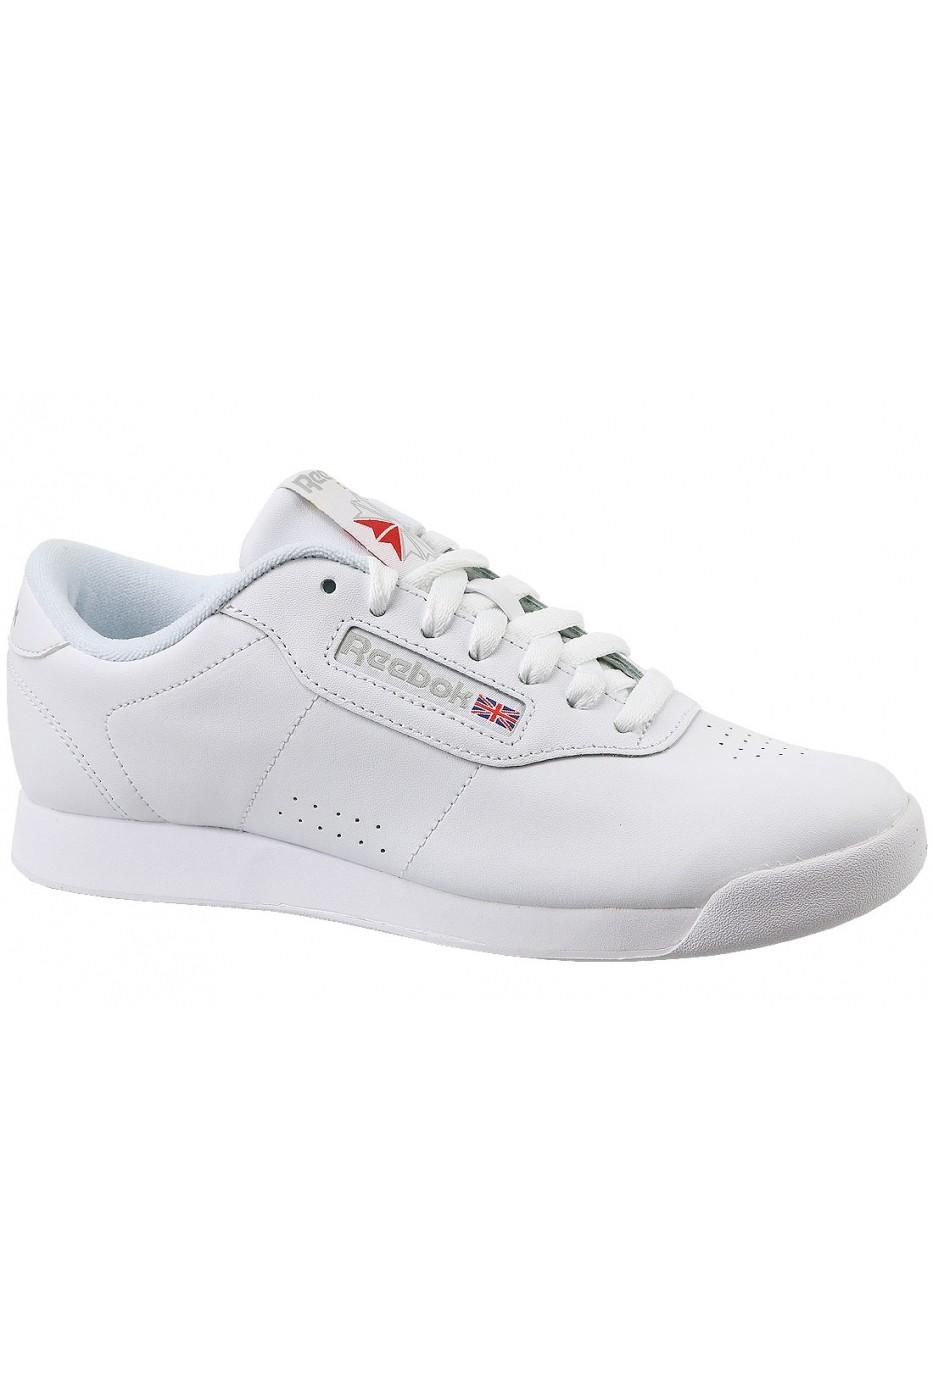 Reebok Sneaker cipő BUT-CN2212 - FashionUP! 6408f44298